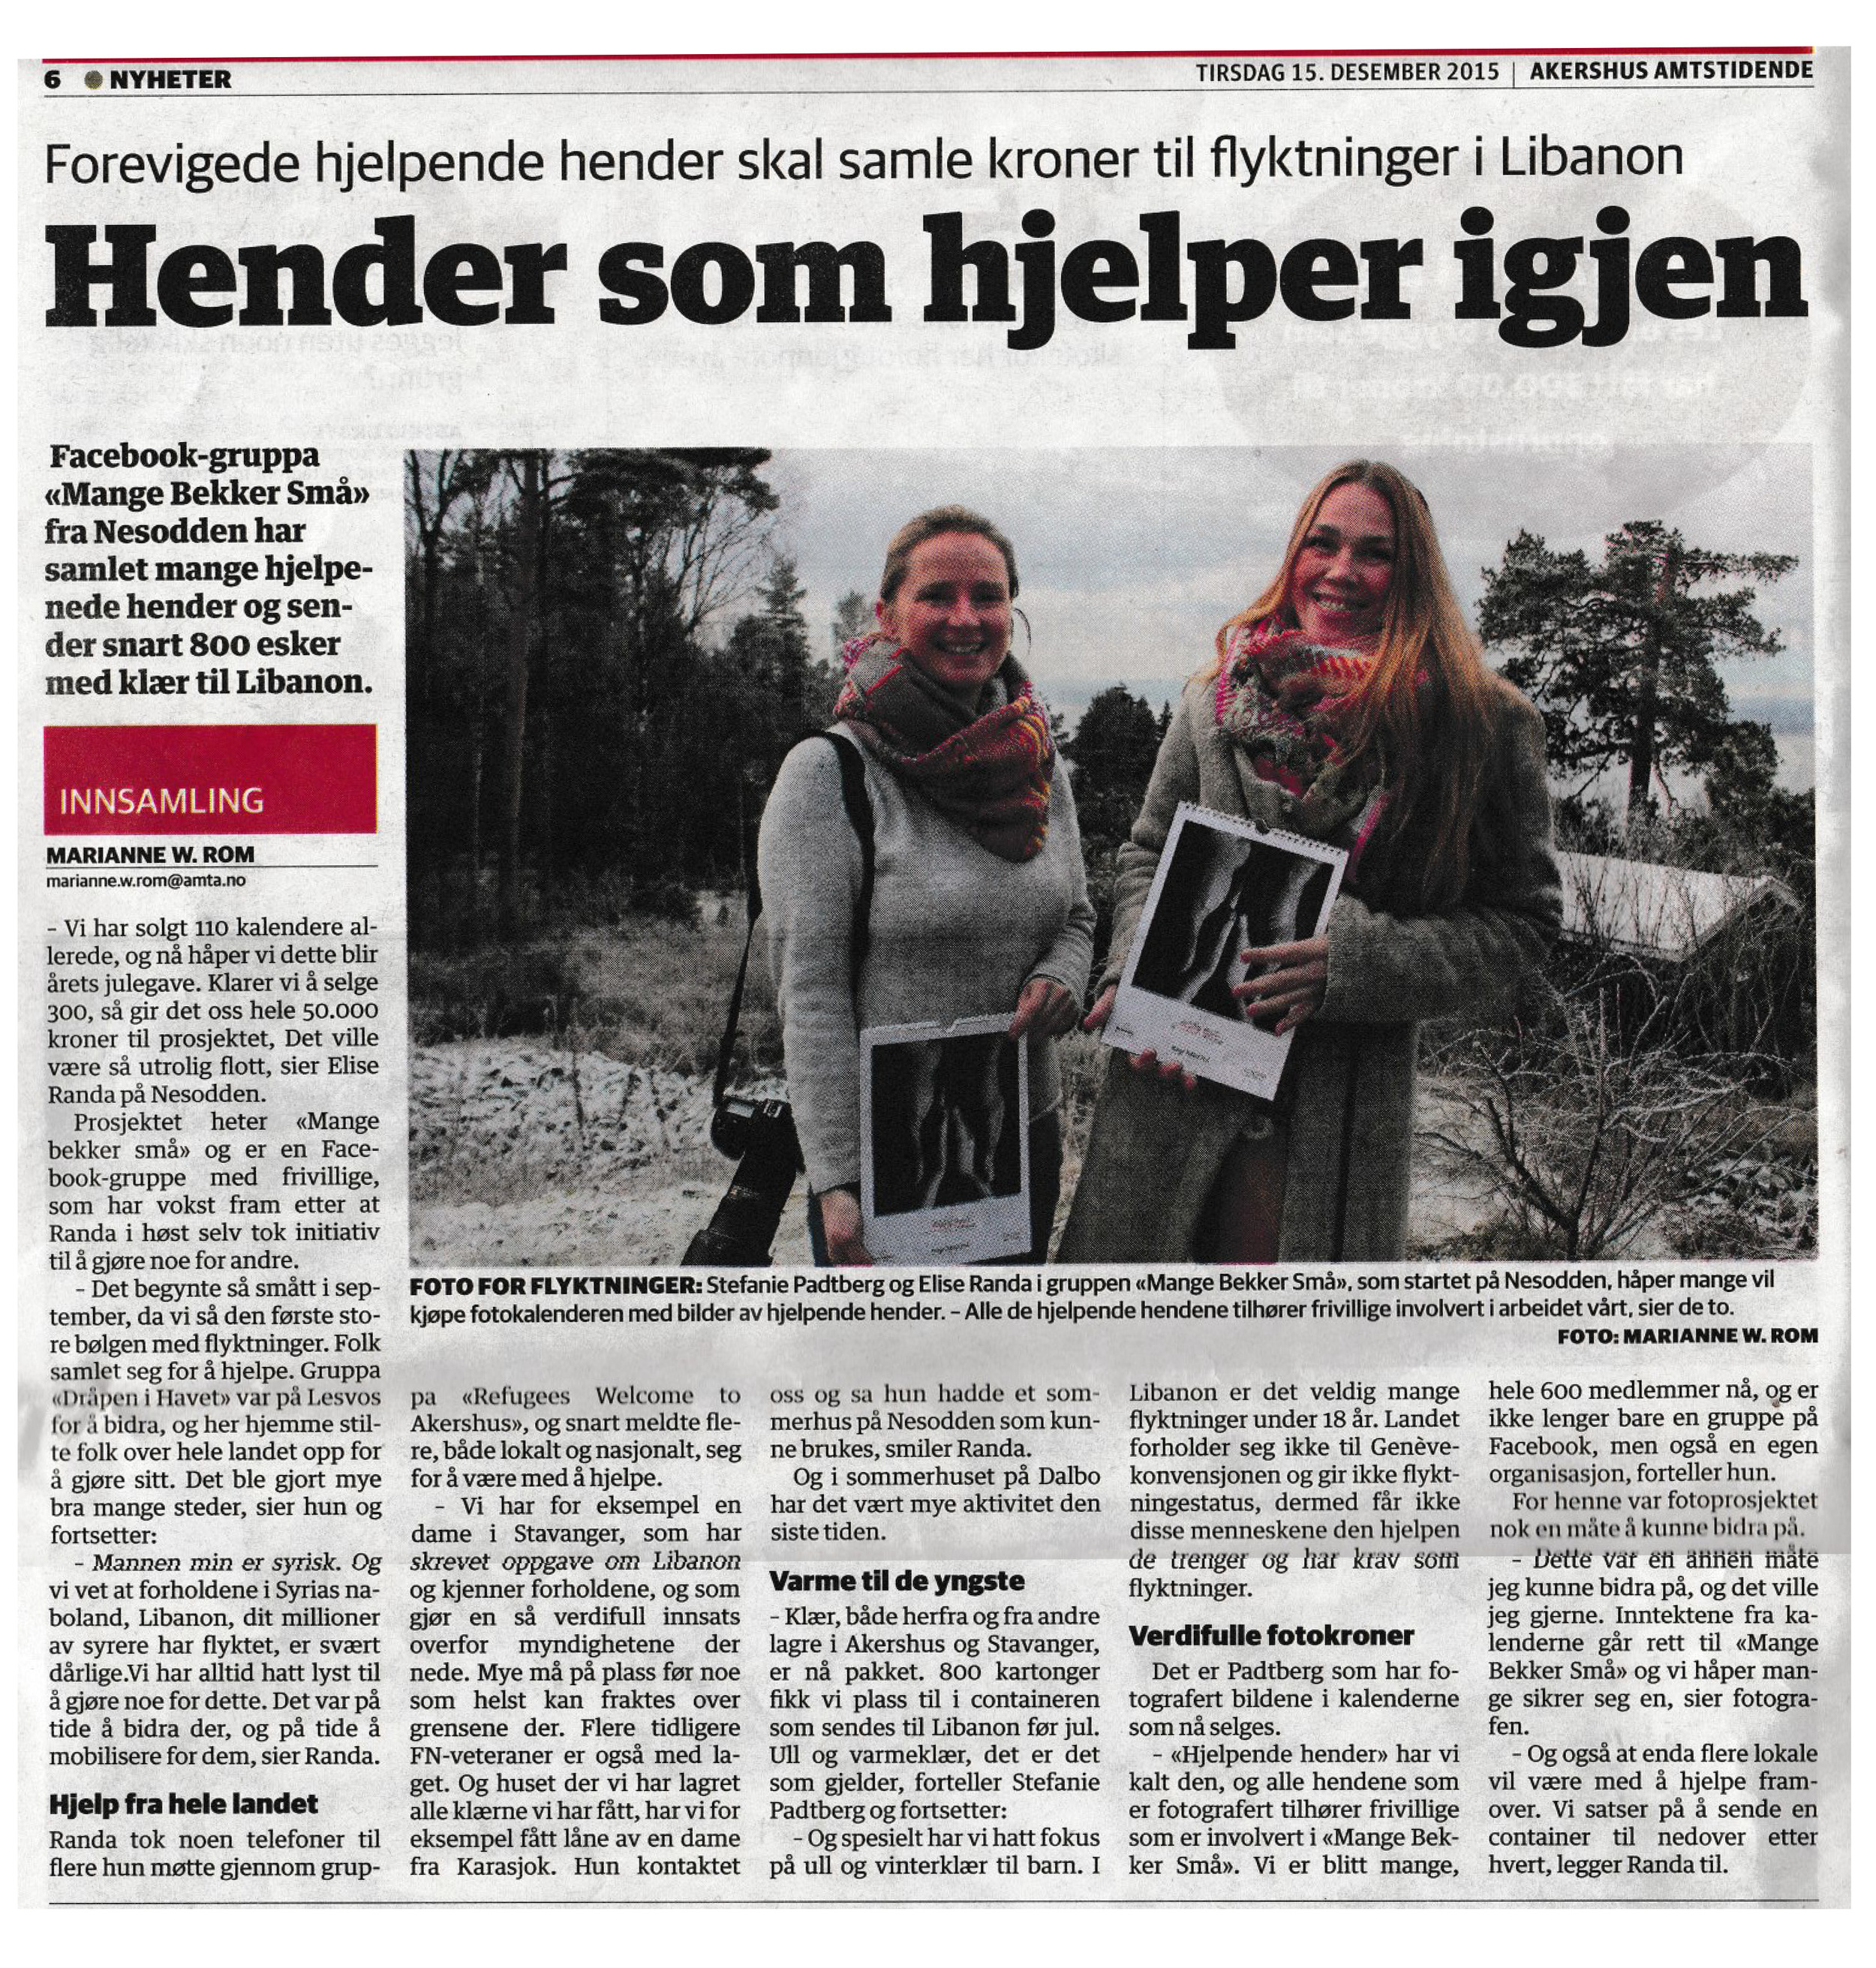 In the local newspaper.